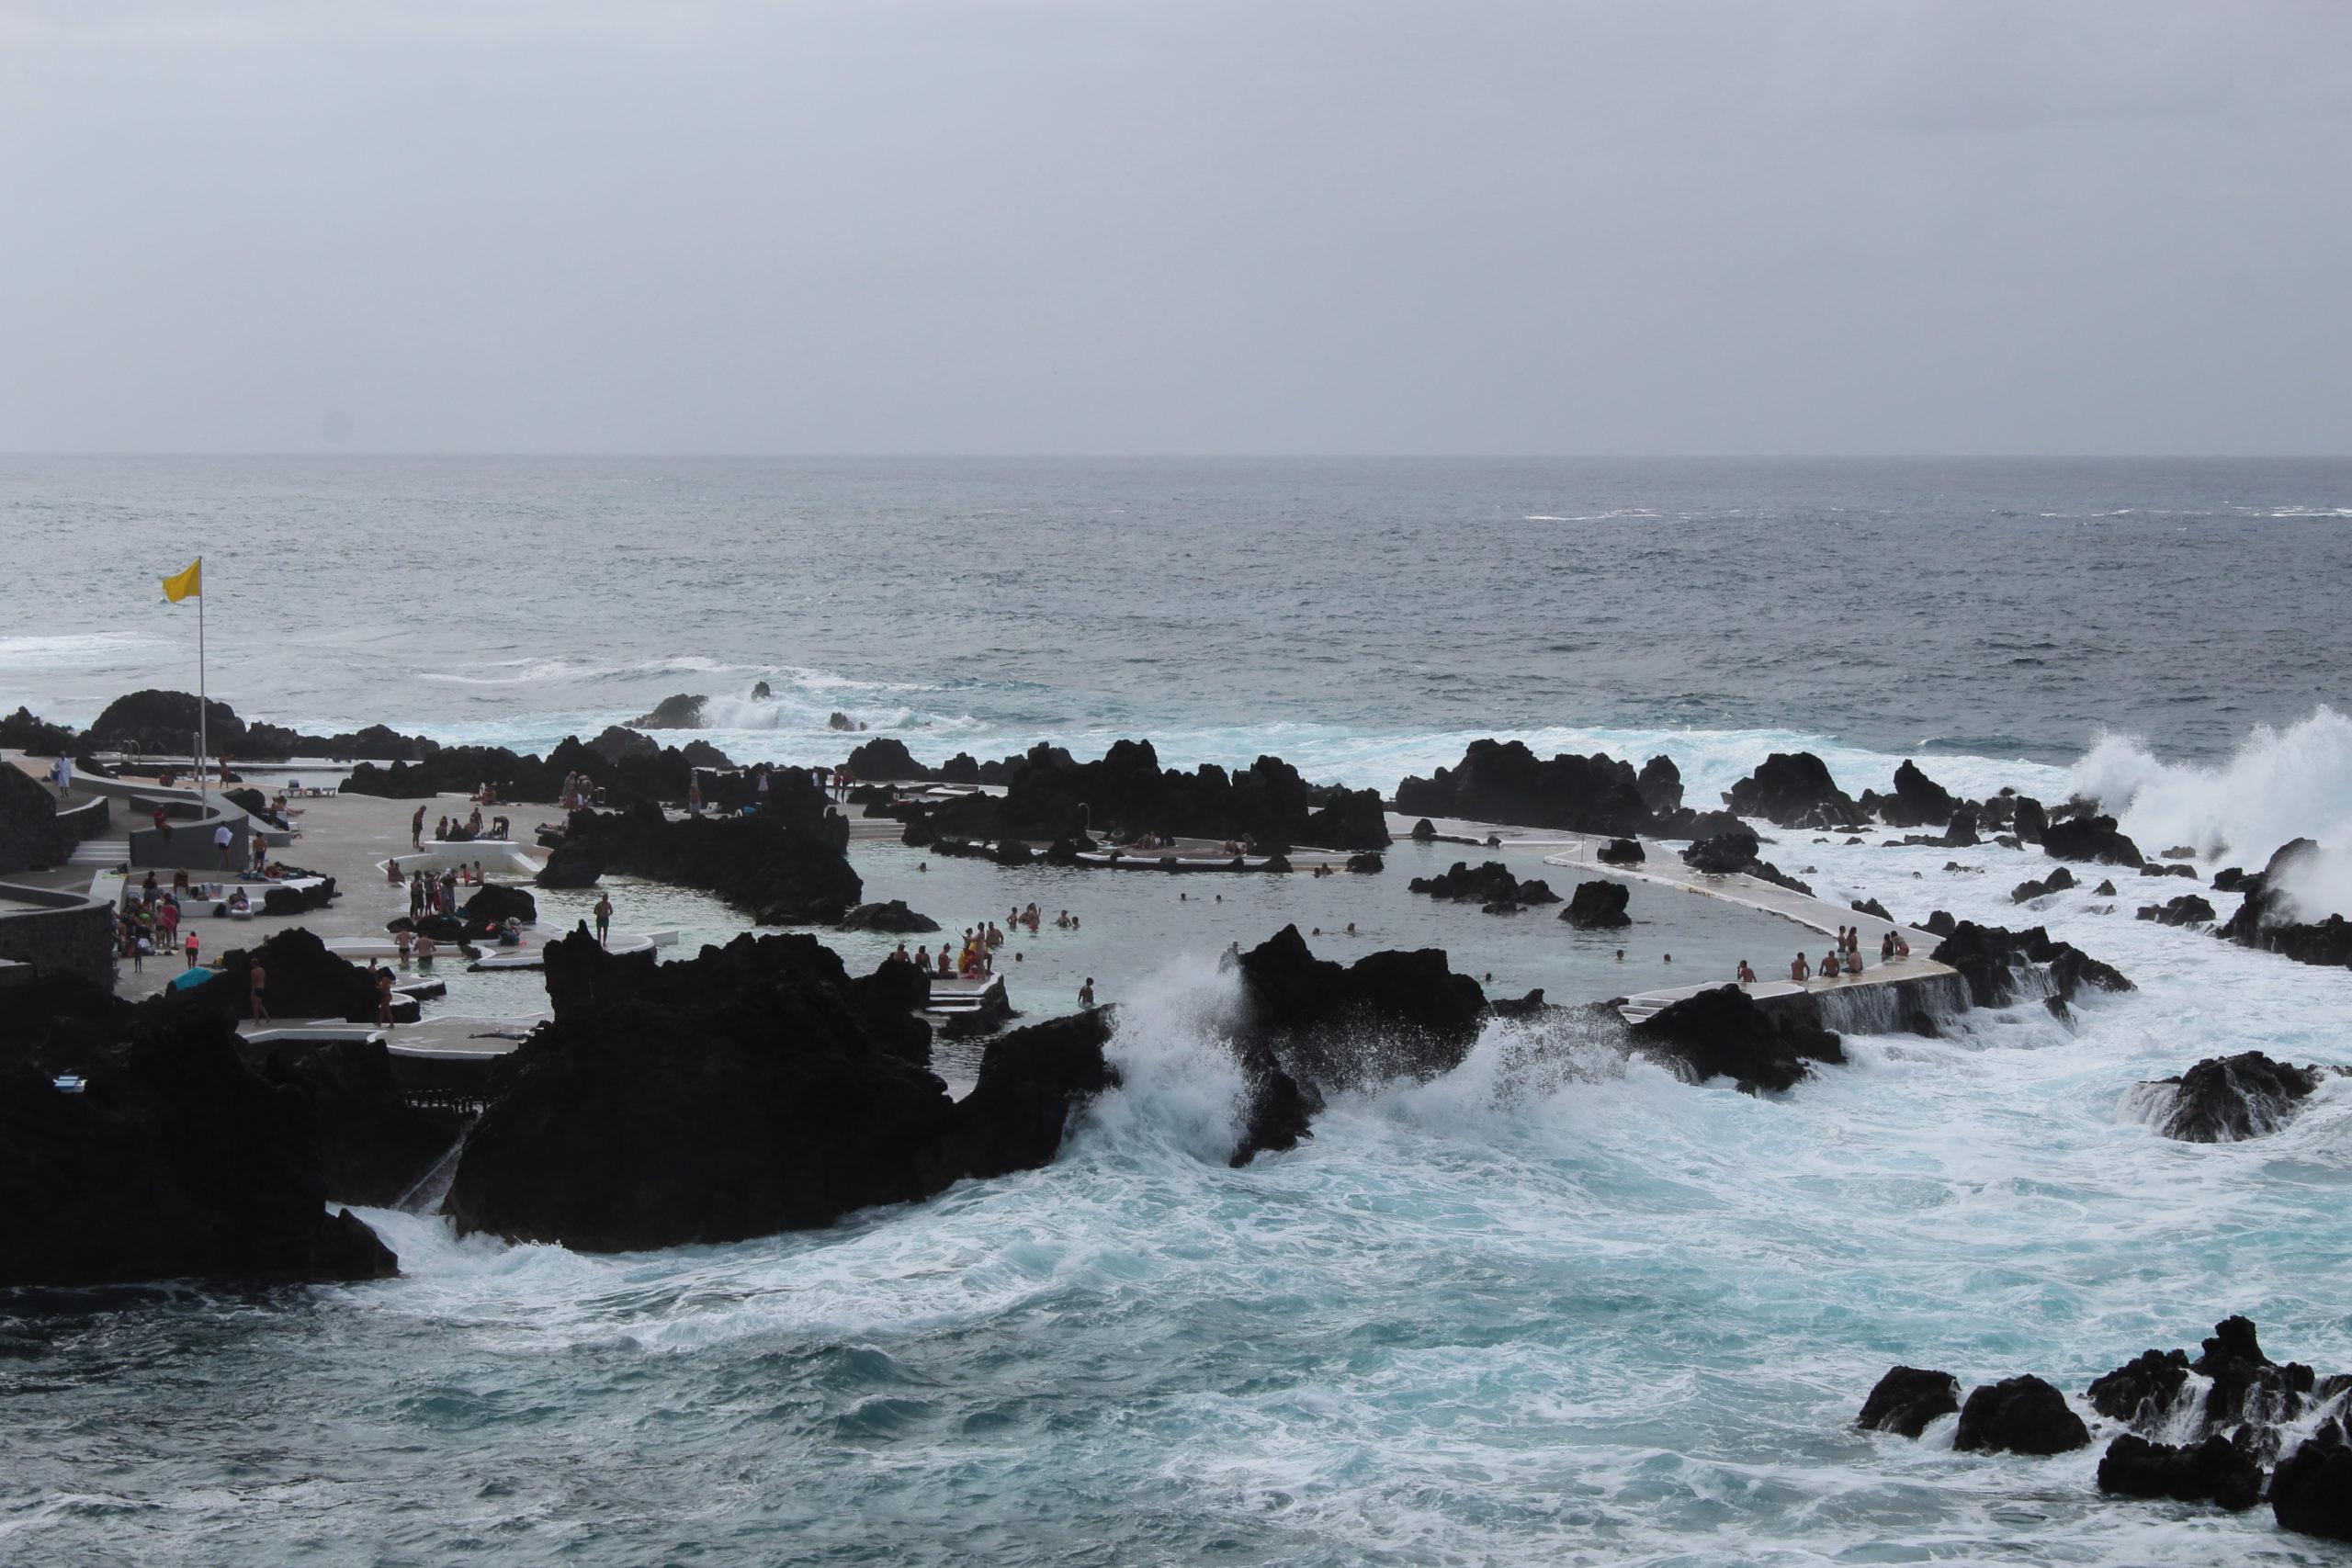 madera widok na wzburzony ocean i basen